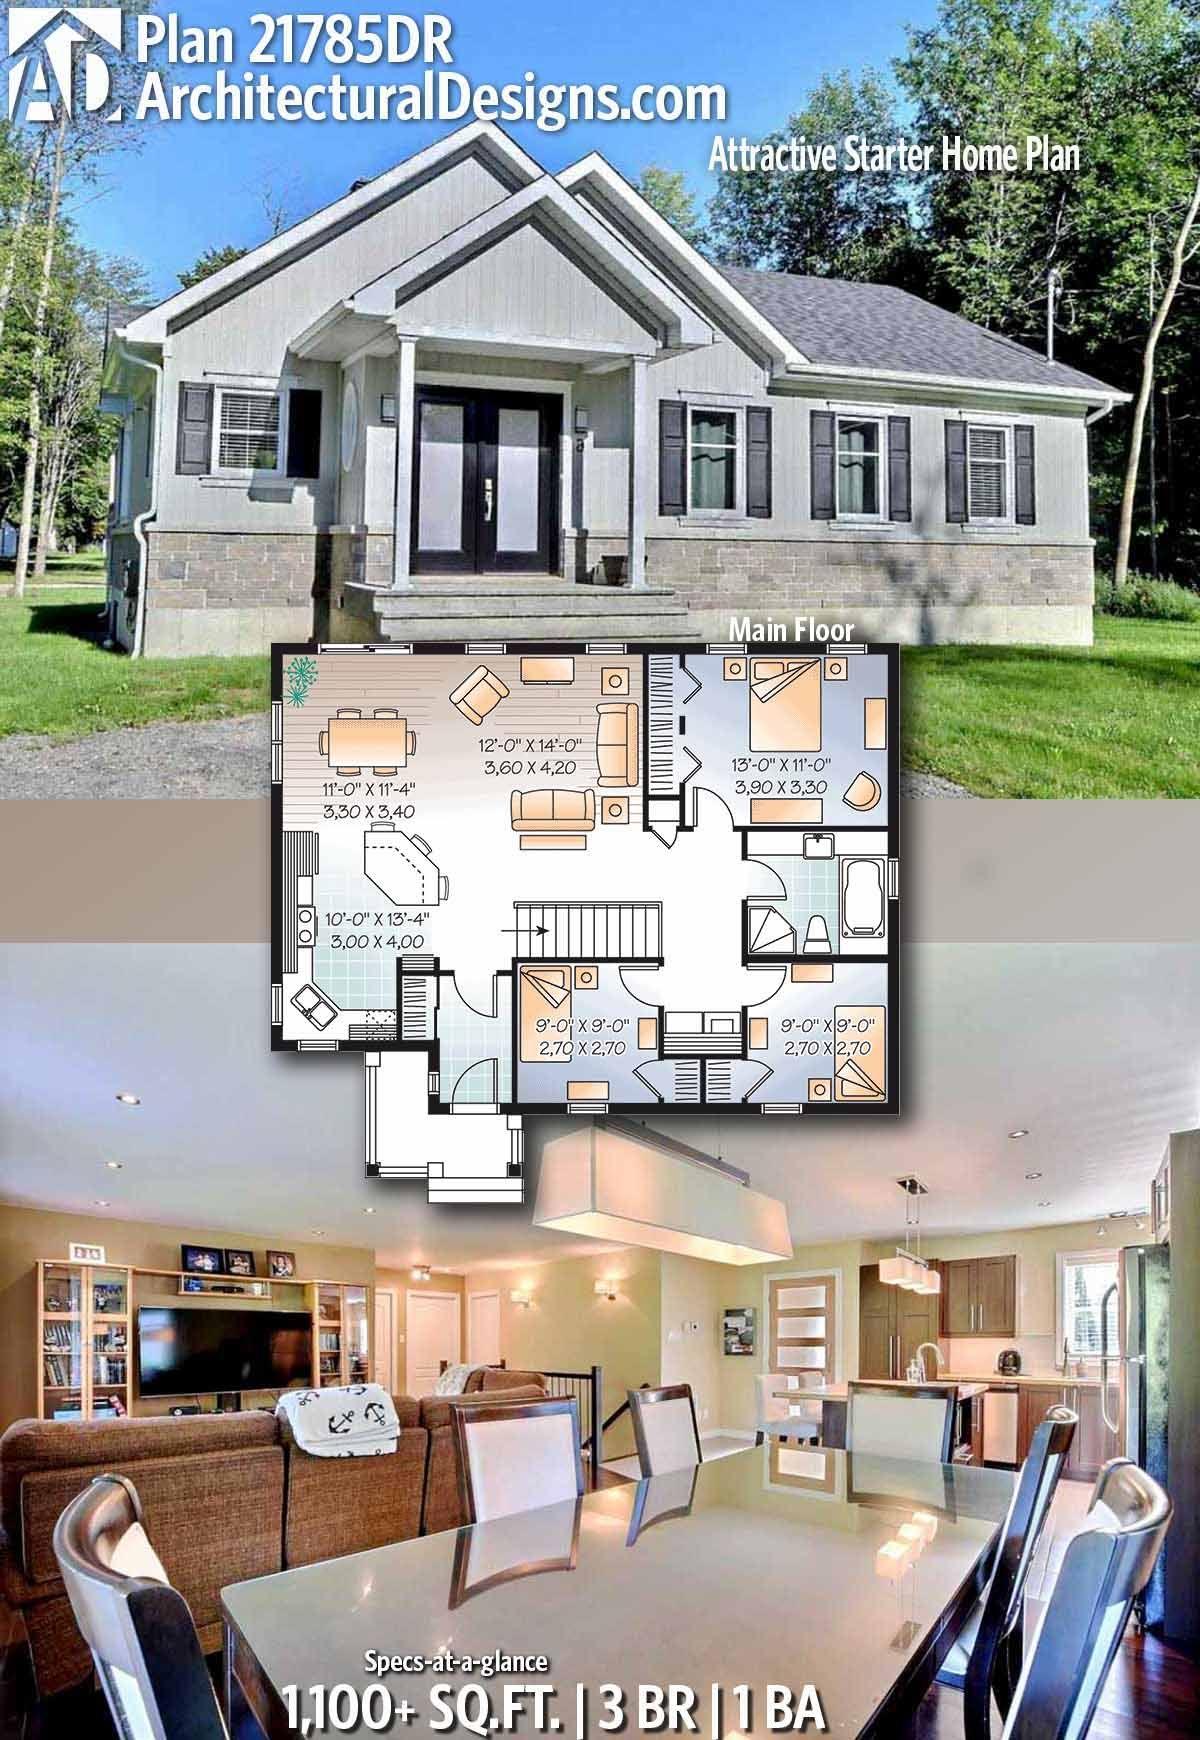 Plan dr attractive starter home plan arquitectura